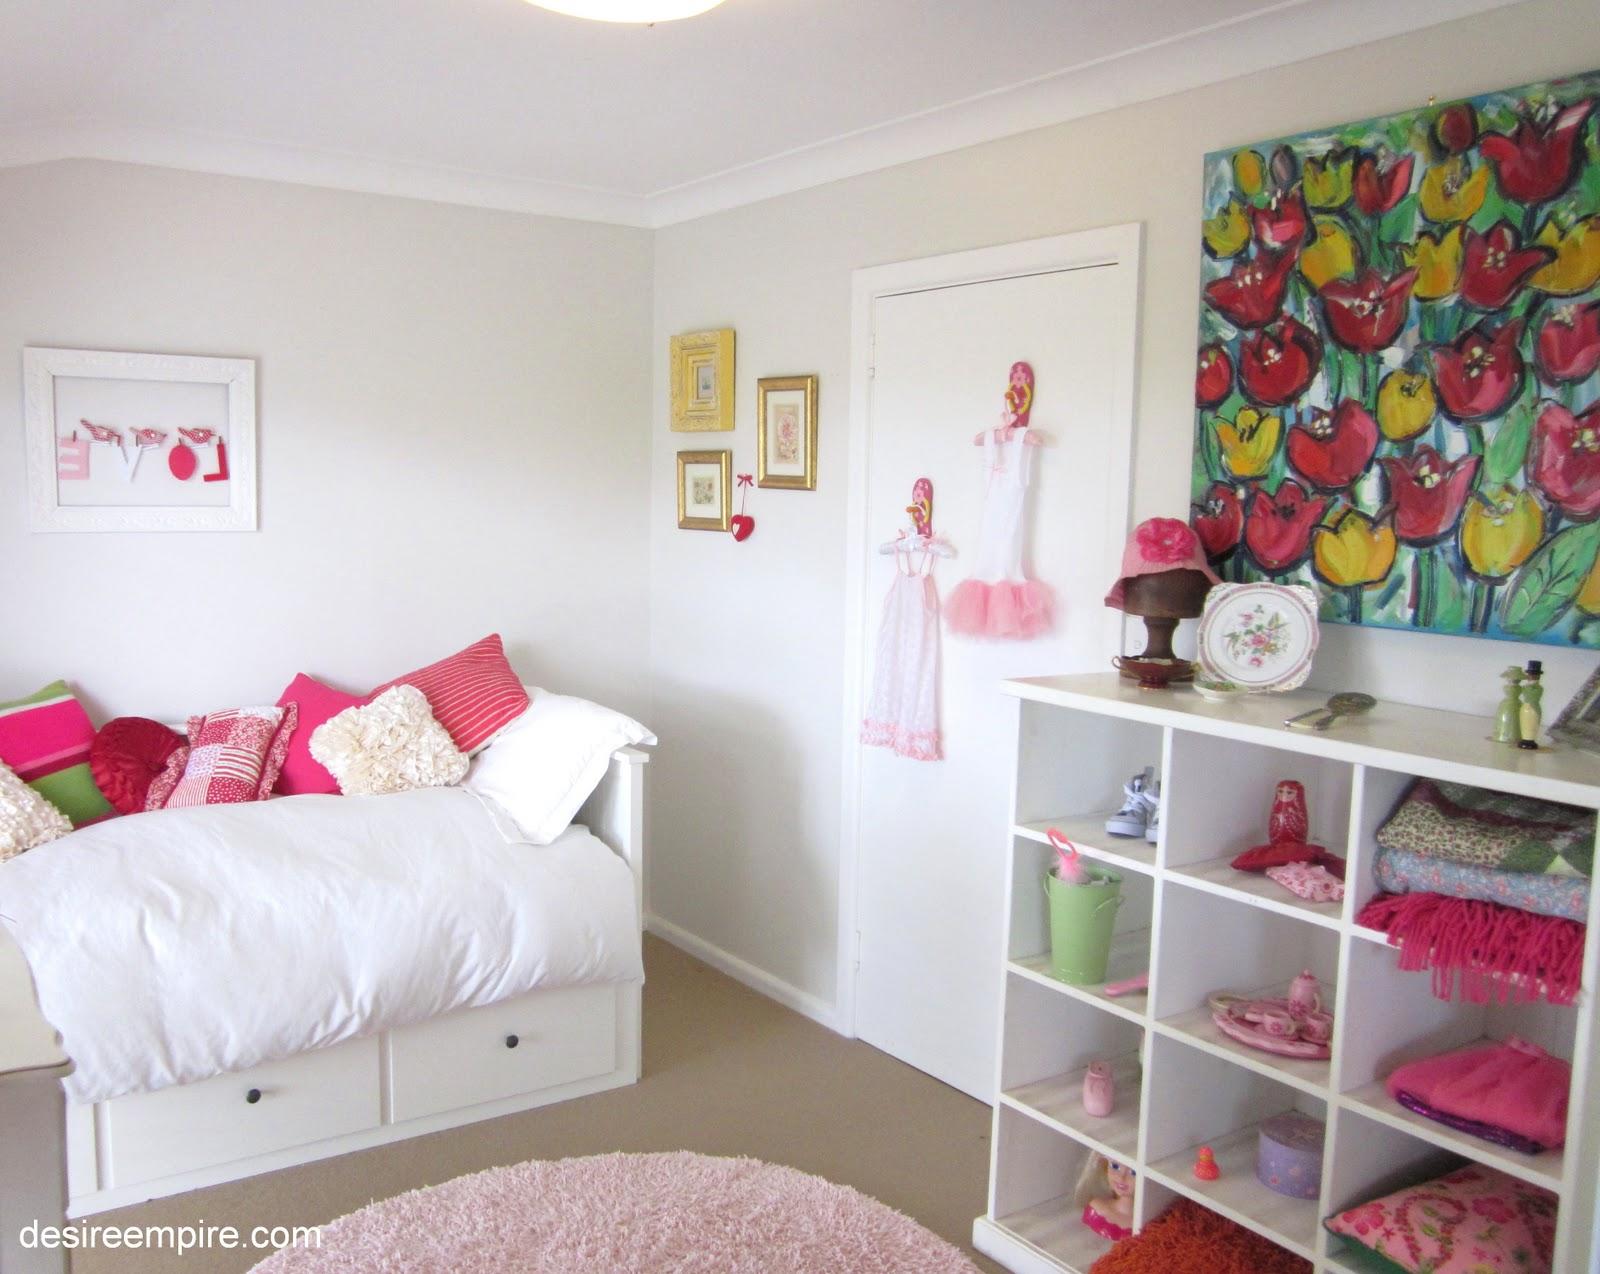 My Little Girl's Bedroom Reveal